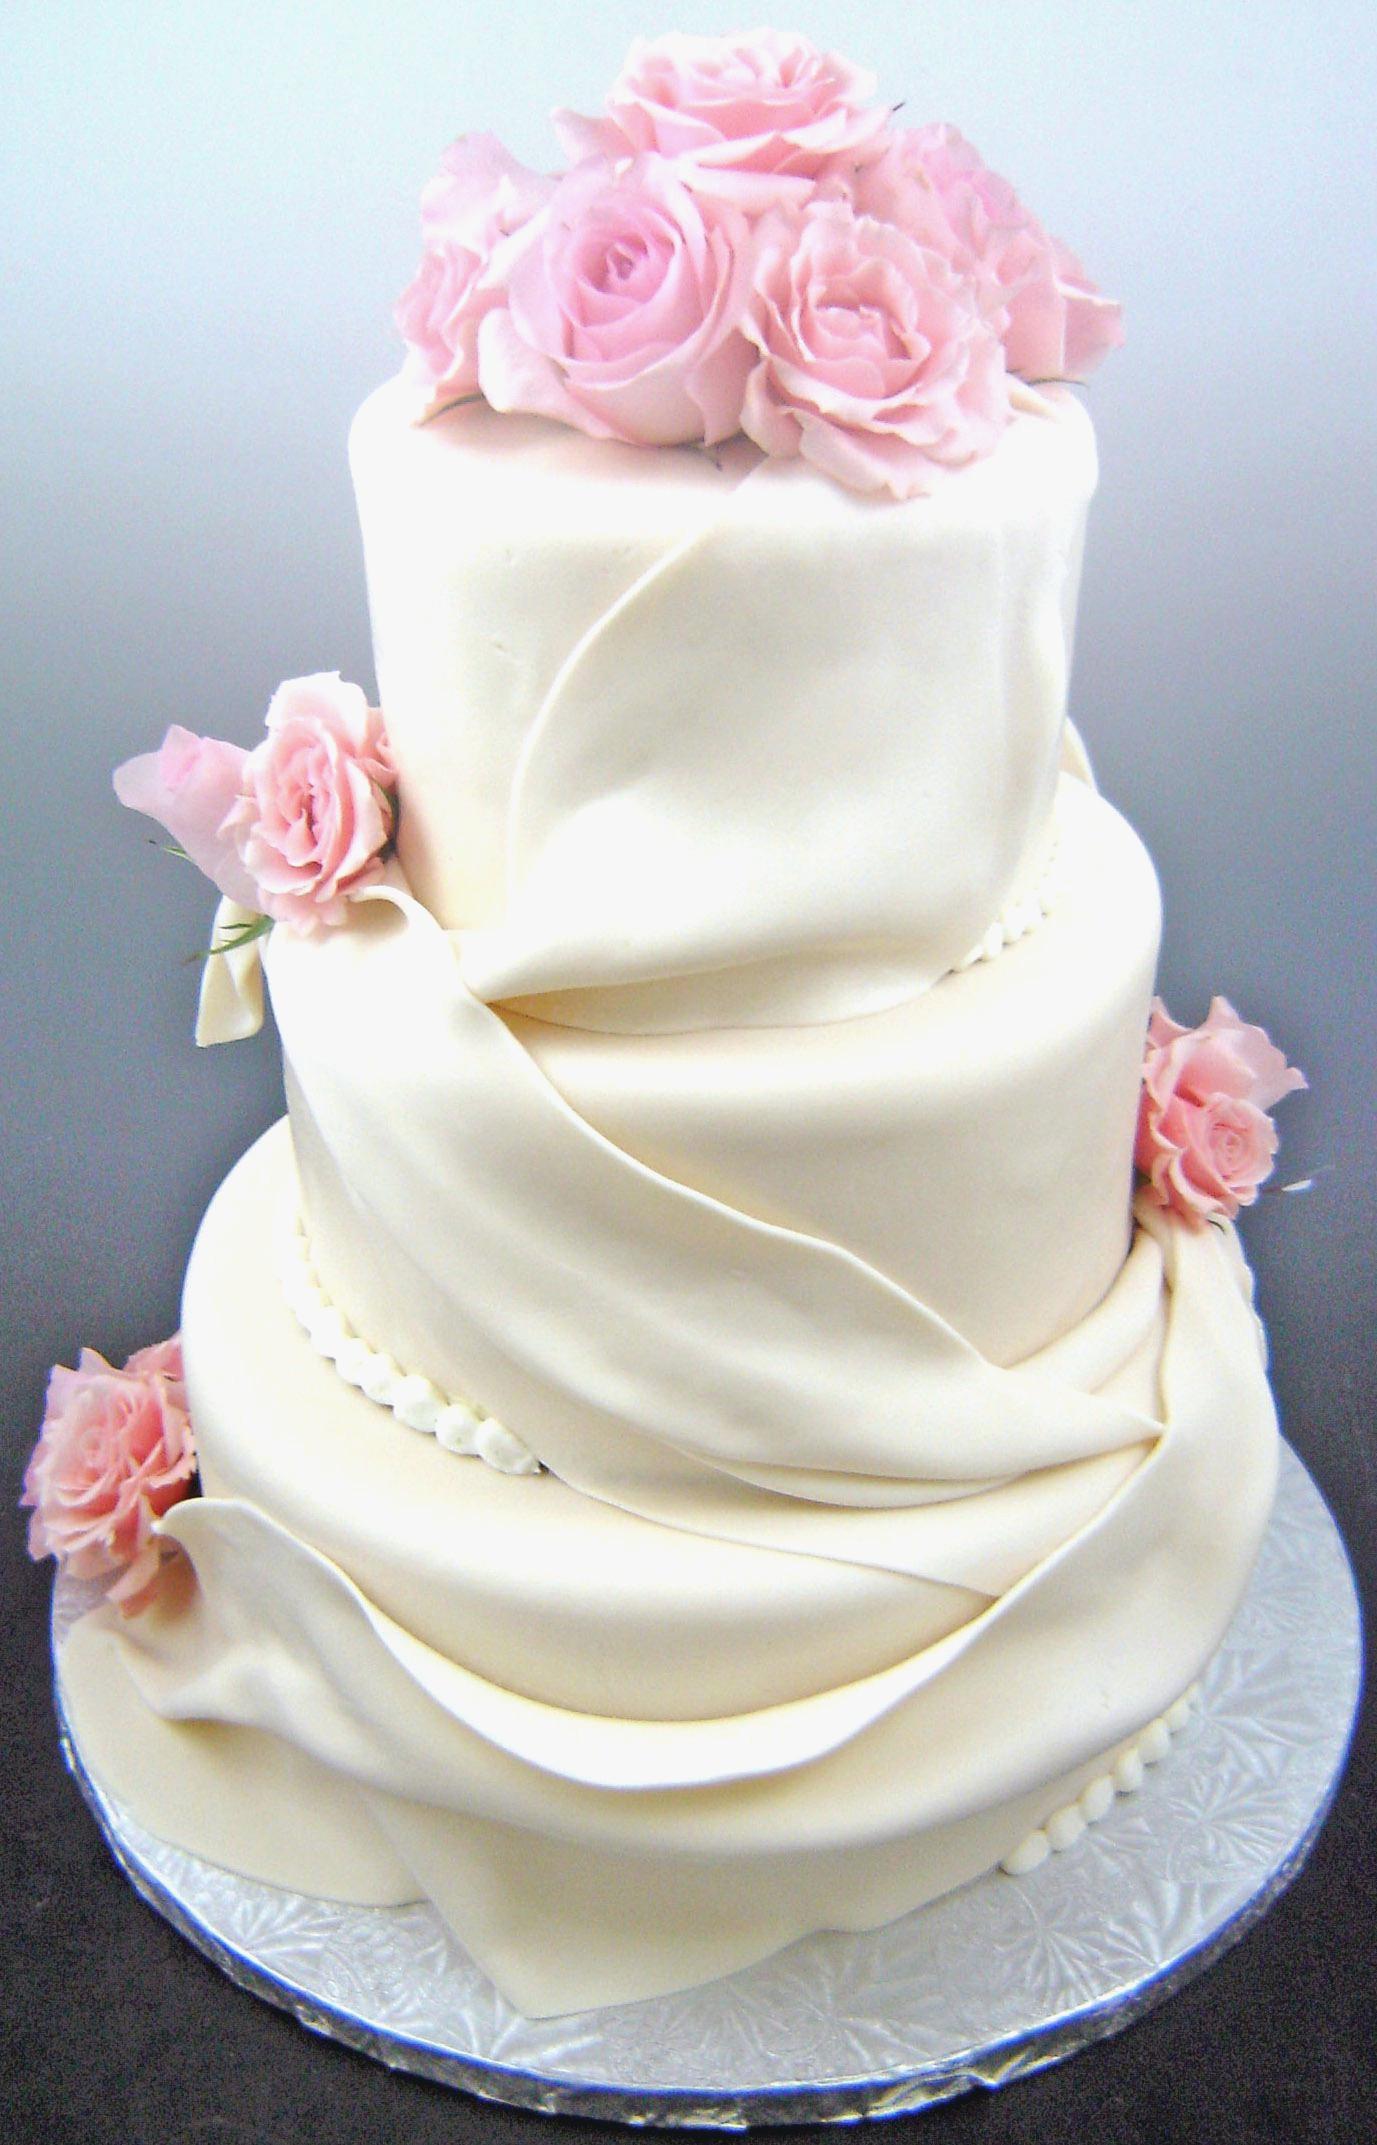 Cheap Wedding Cakes Walmart  Unique Wedding Cakes From Walmart Fancy Cheap